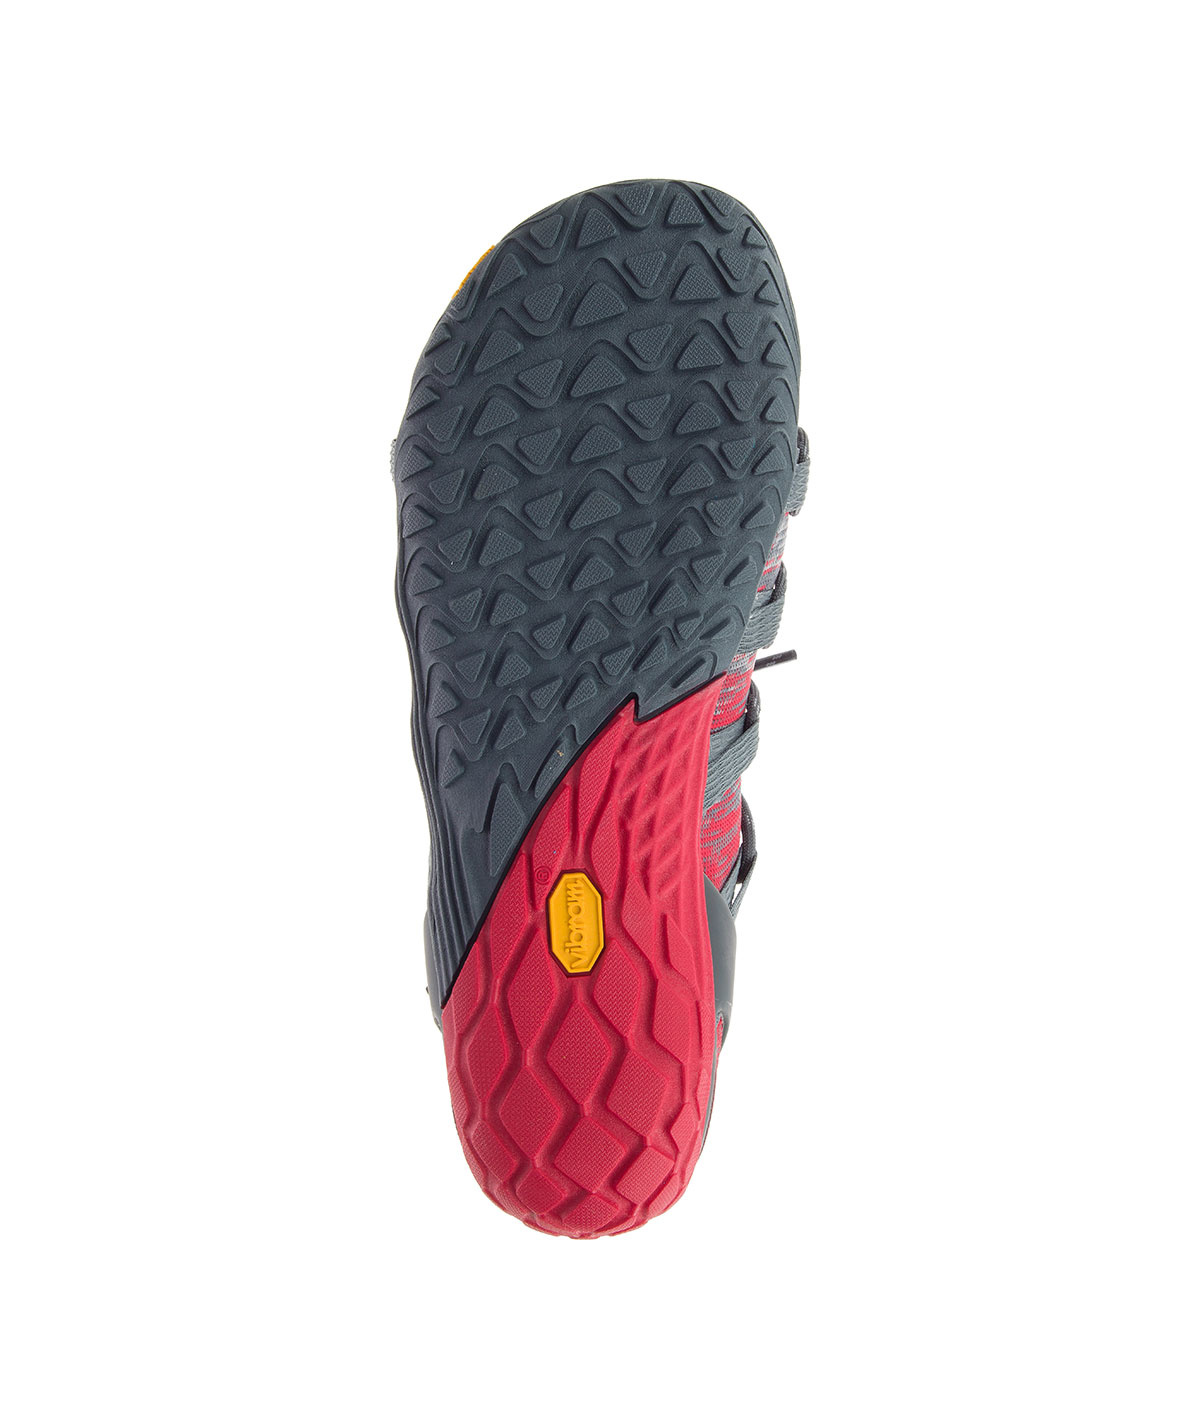 merrel Vapor glove 4 3D turbulence/cherry